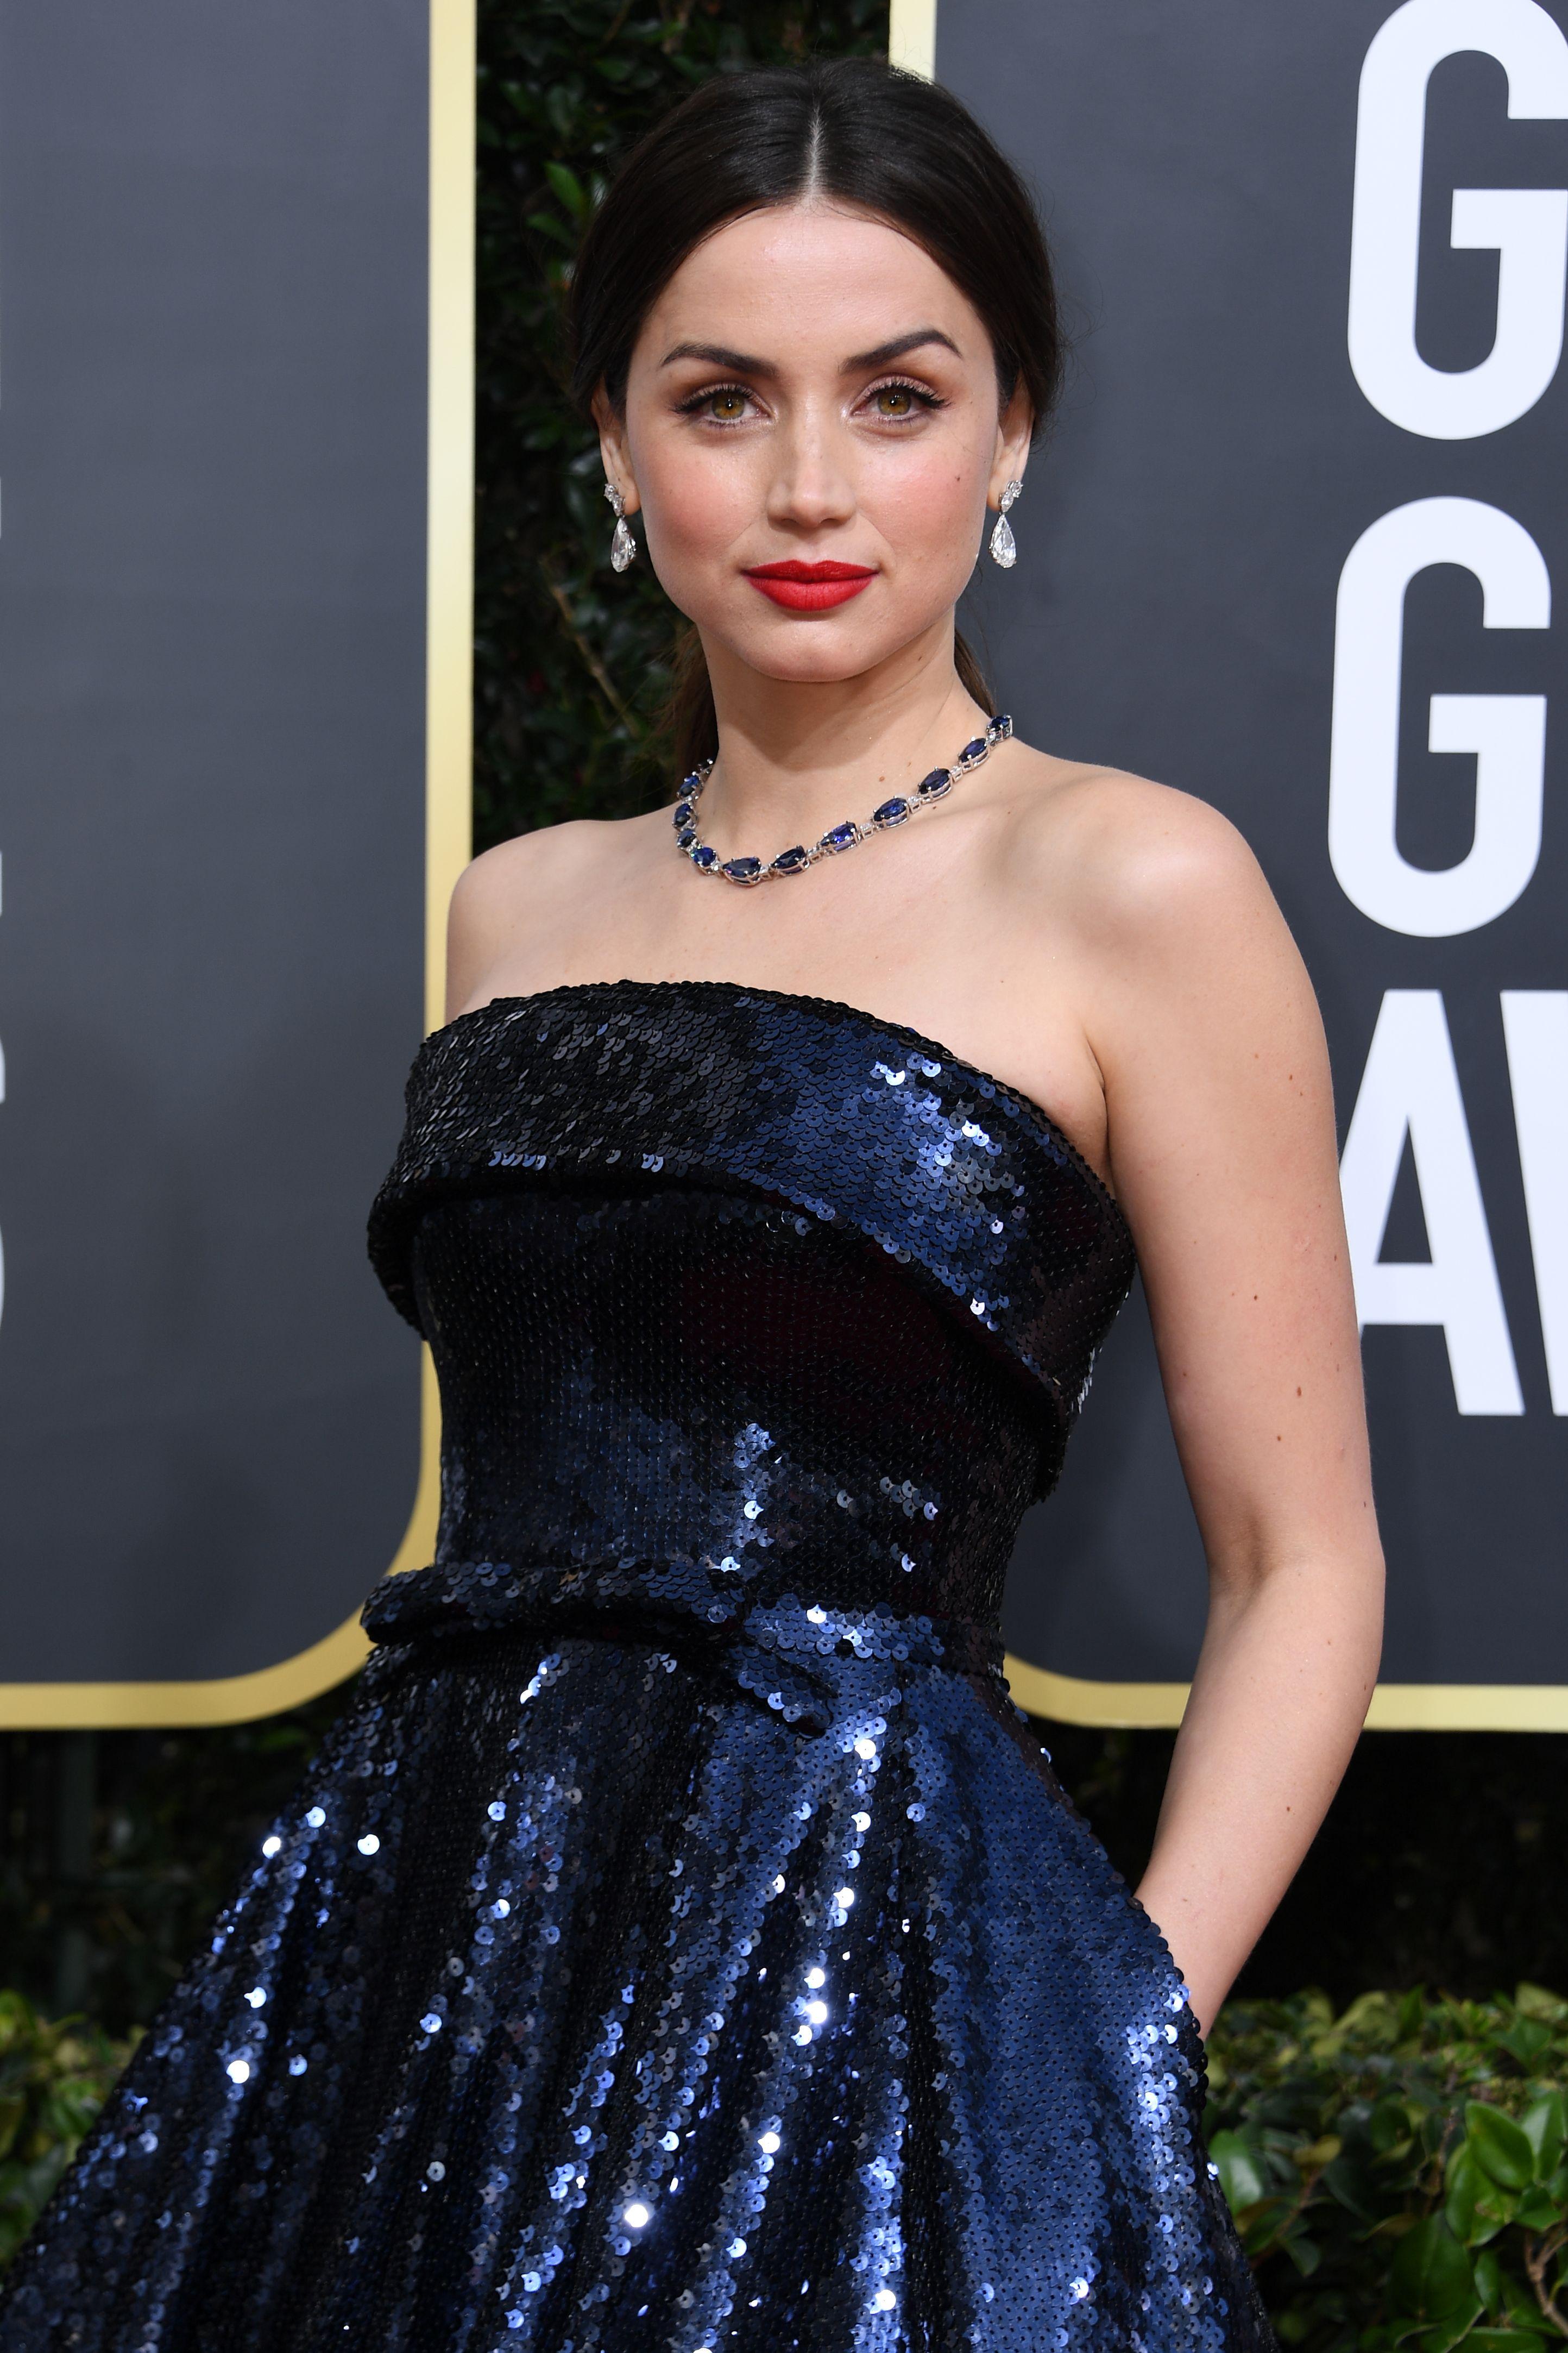 Ana de Armas at an event for 2020 Golden Globe Awards (2020)